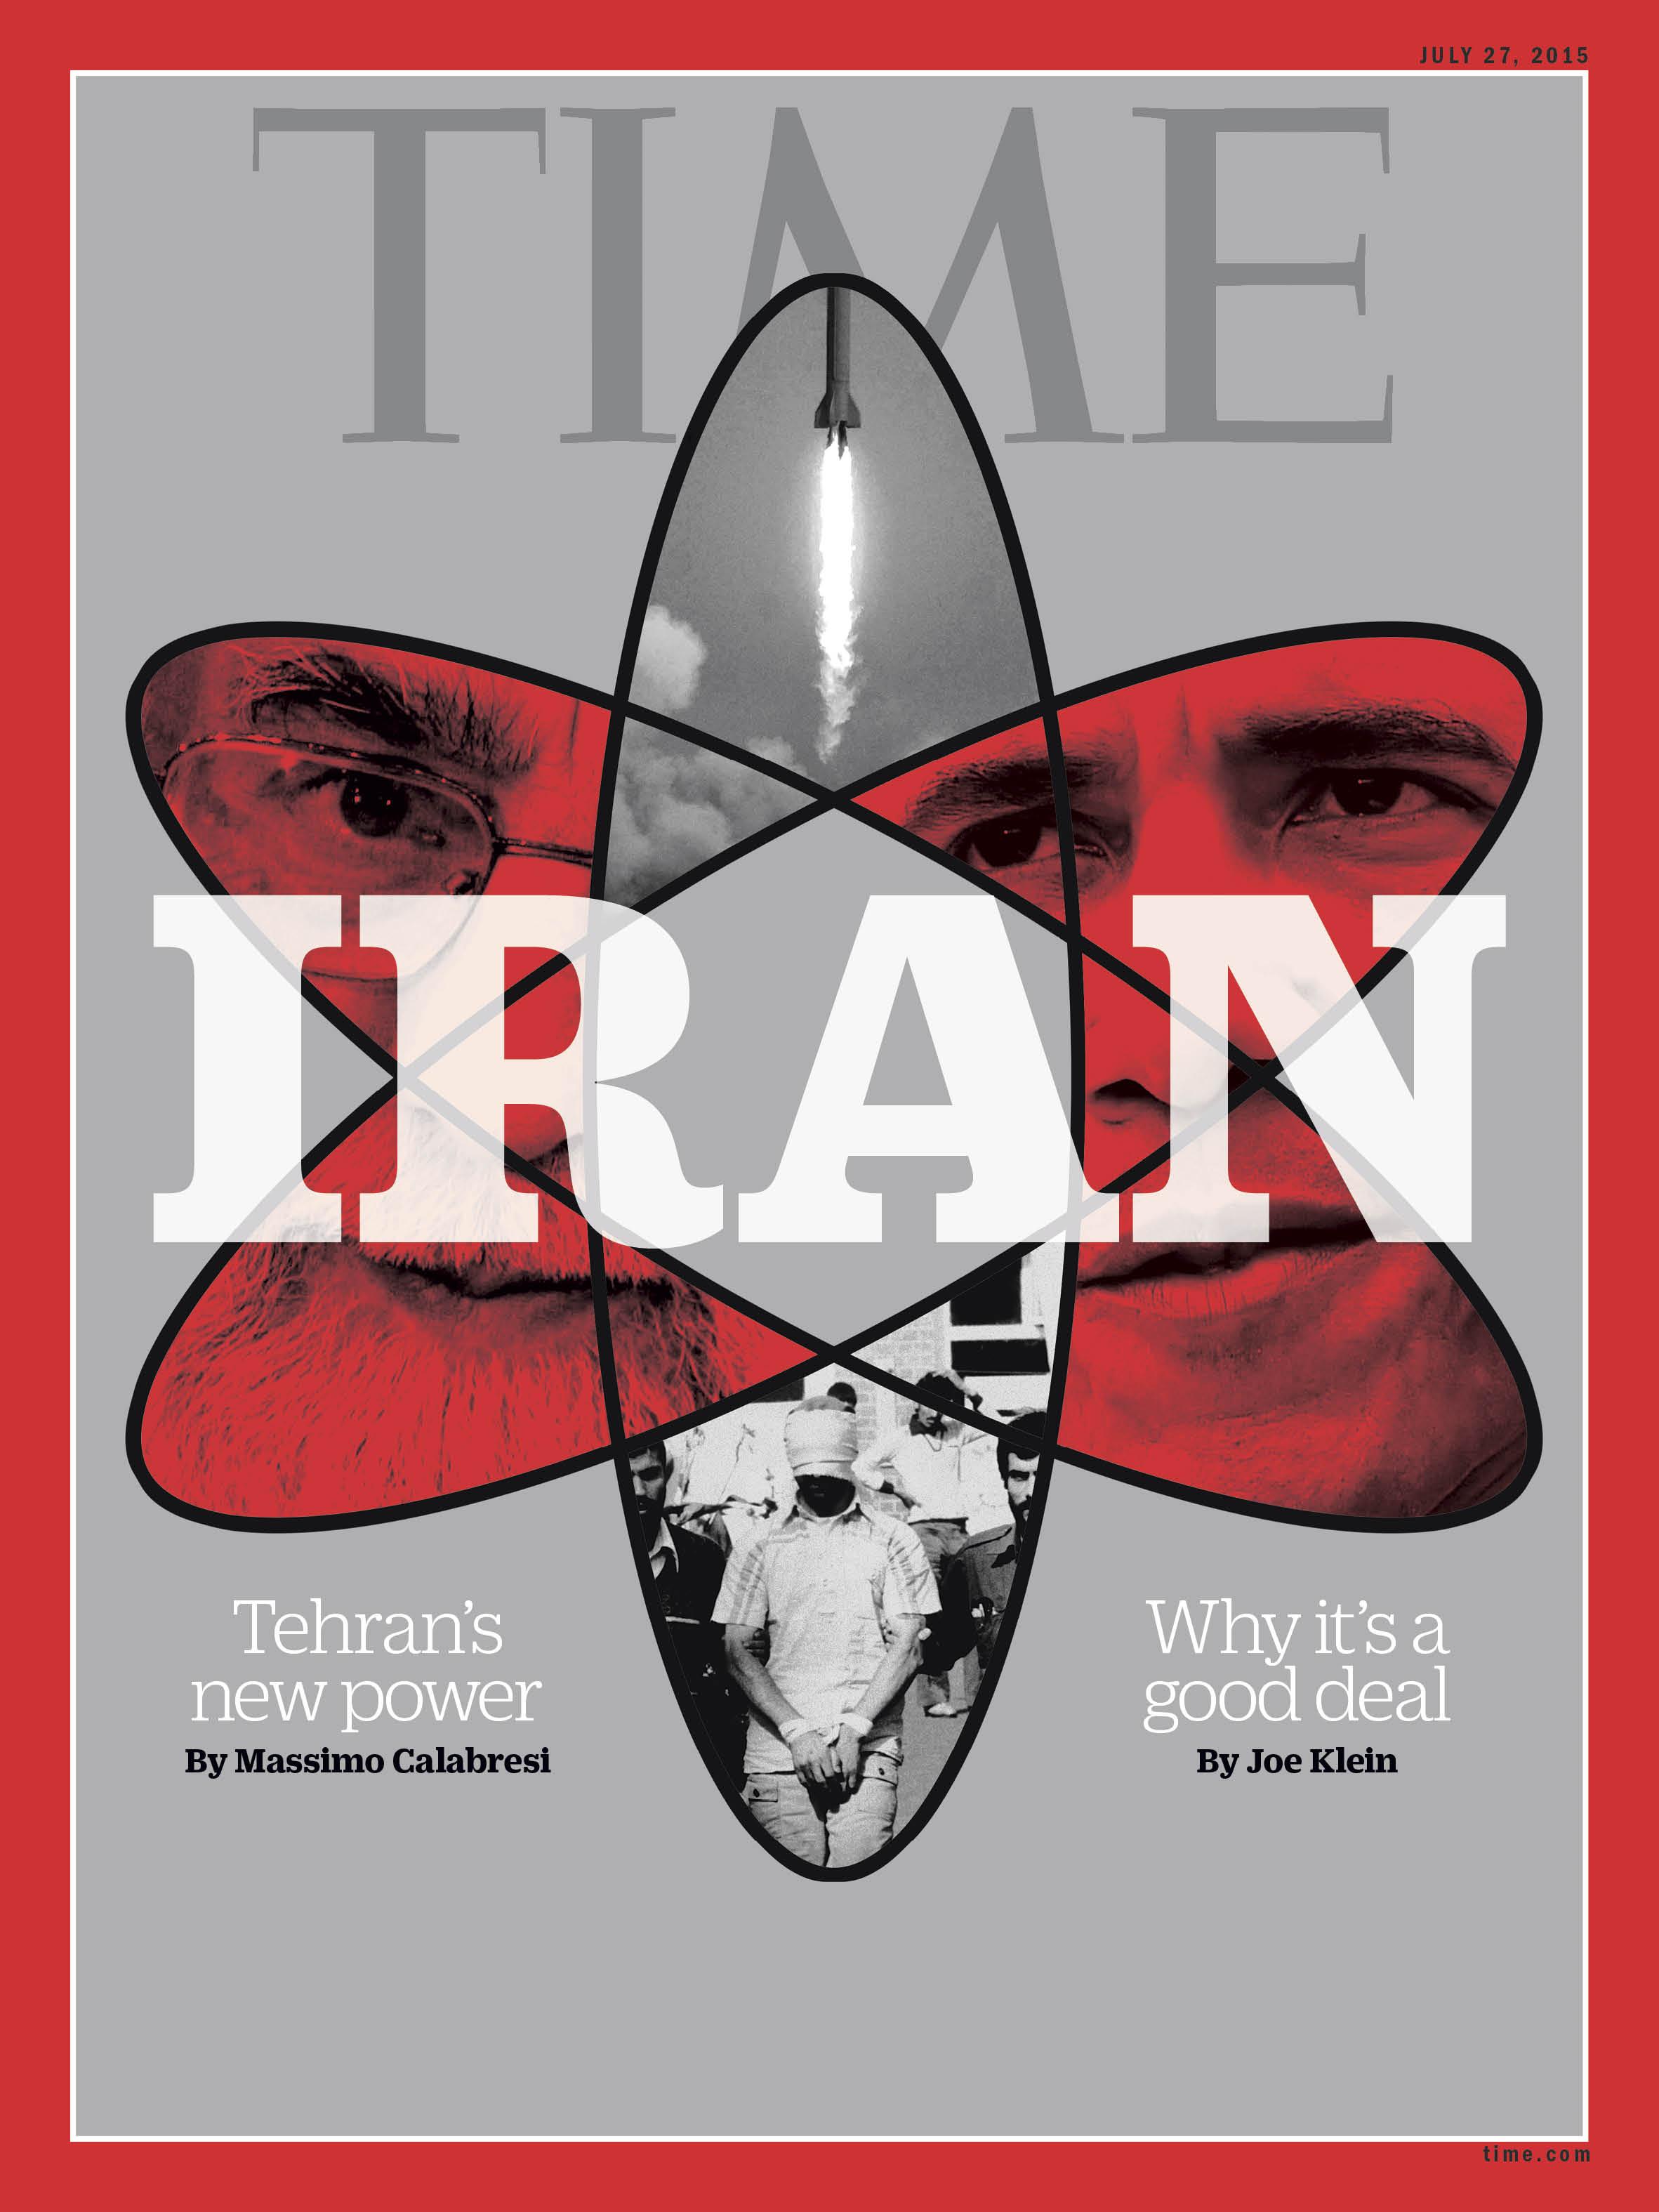 iran-cover.jpg